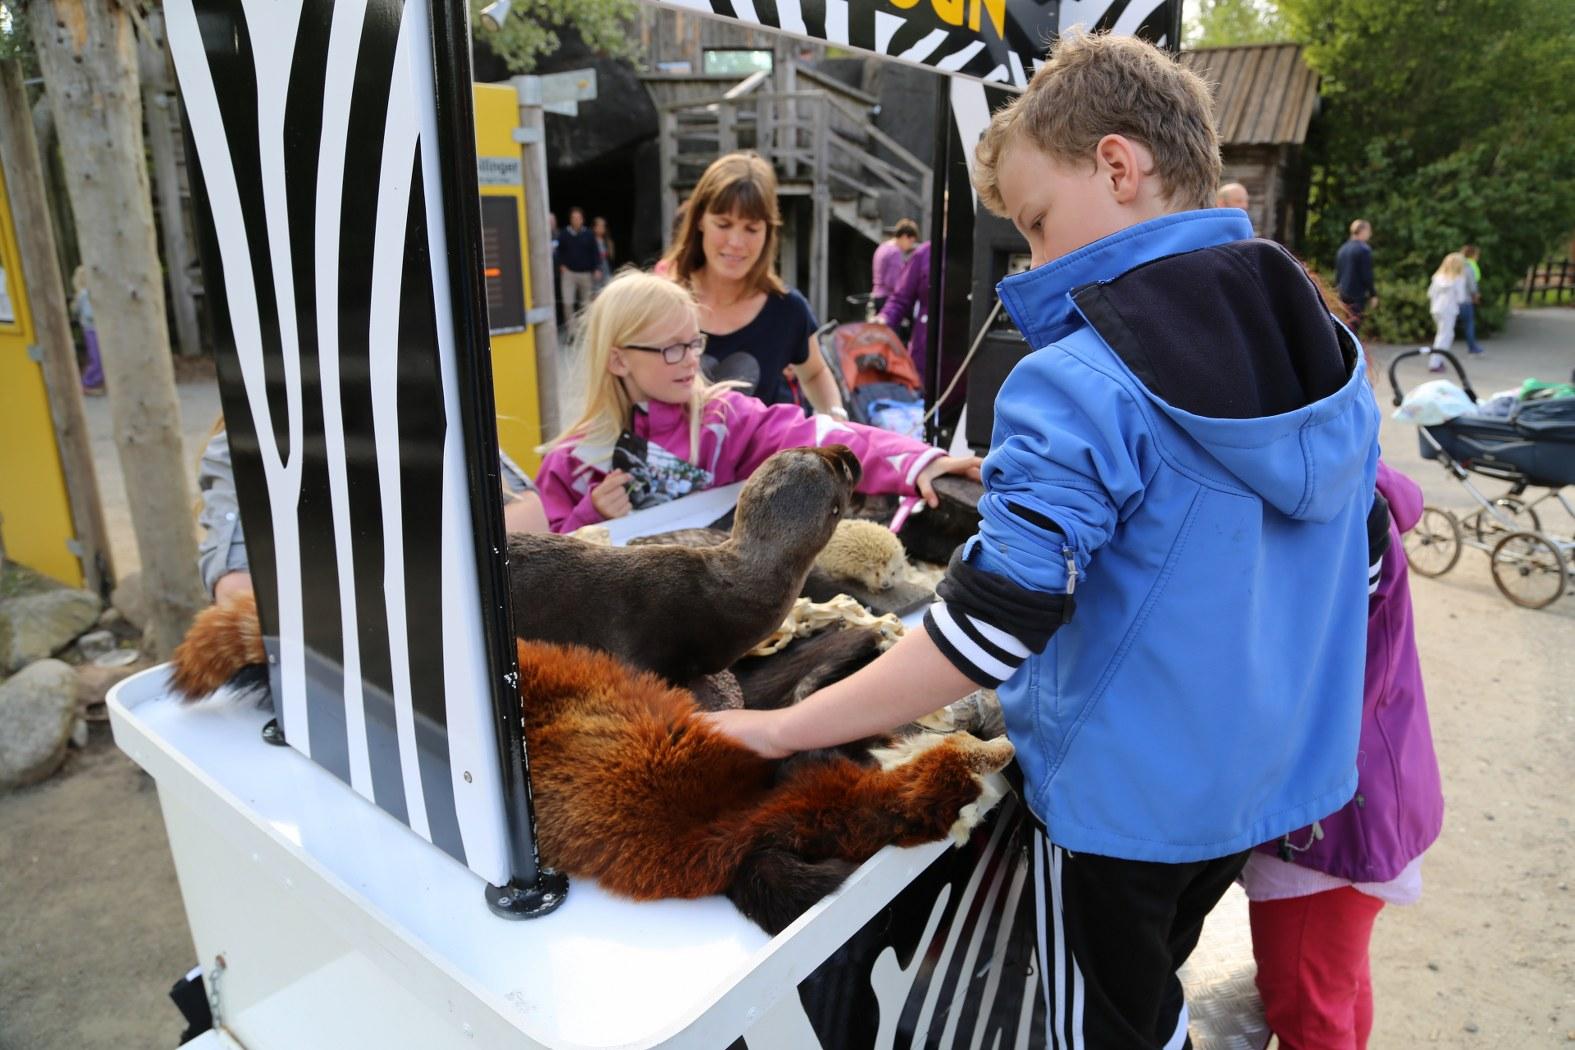 Jylland ordsprog rabat zoo odense